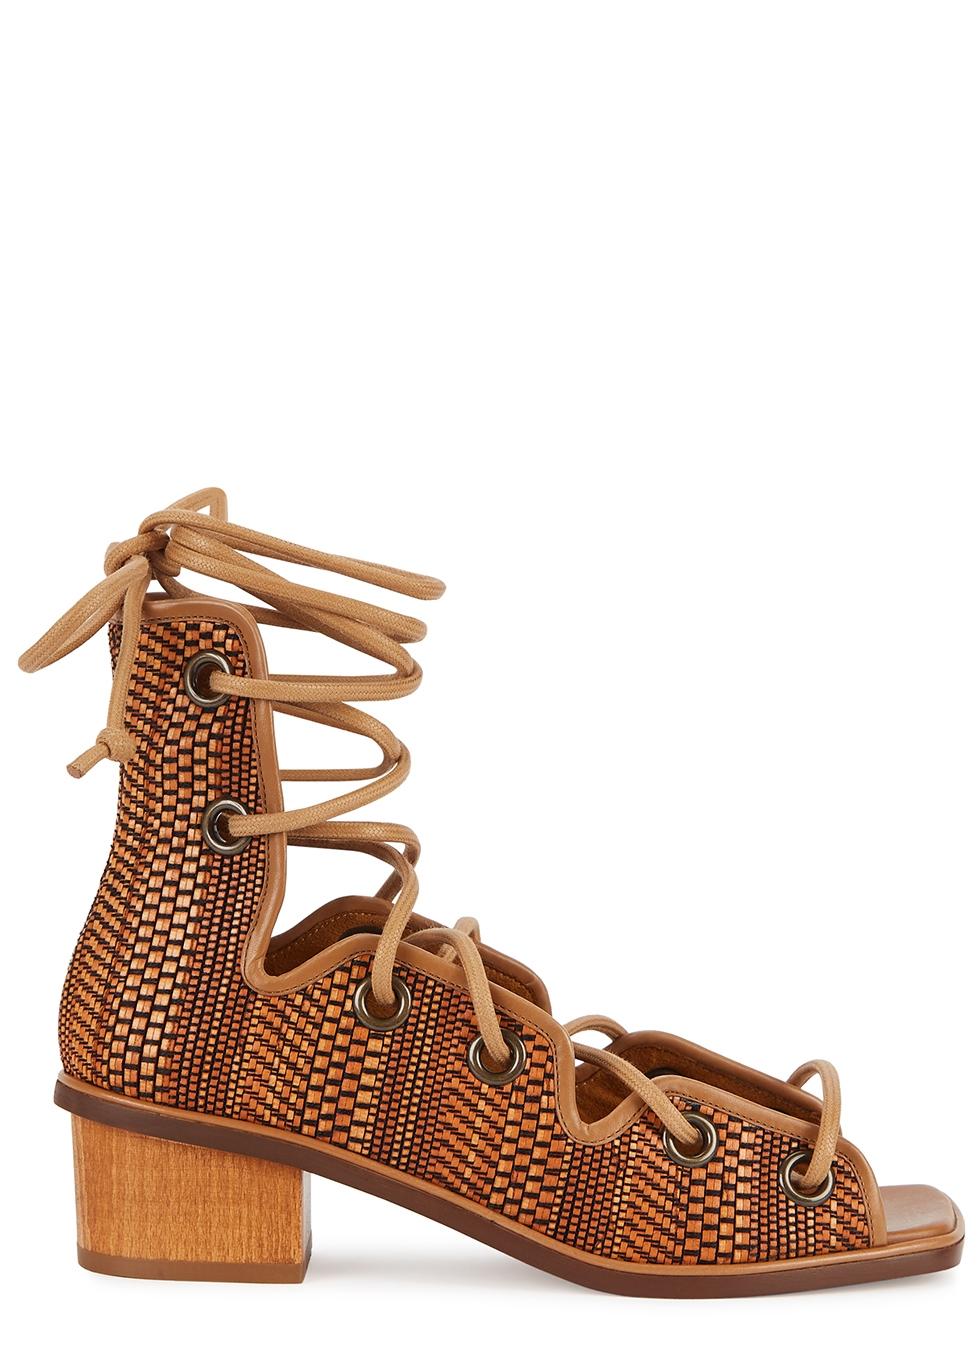 Maia 40 brown lace-up raffia sandals